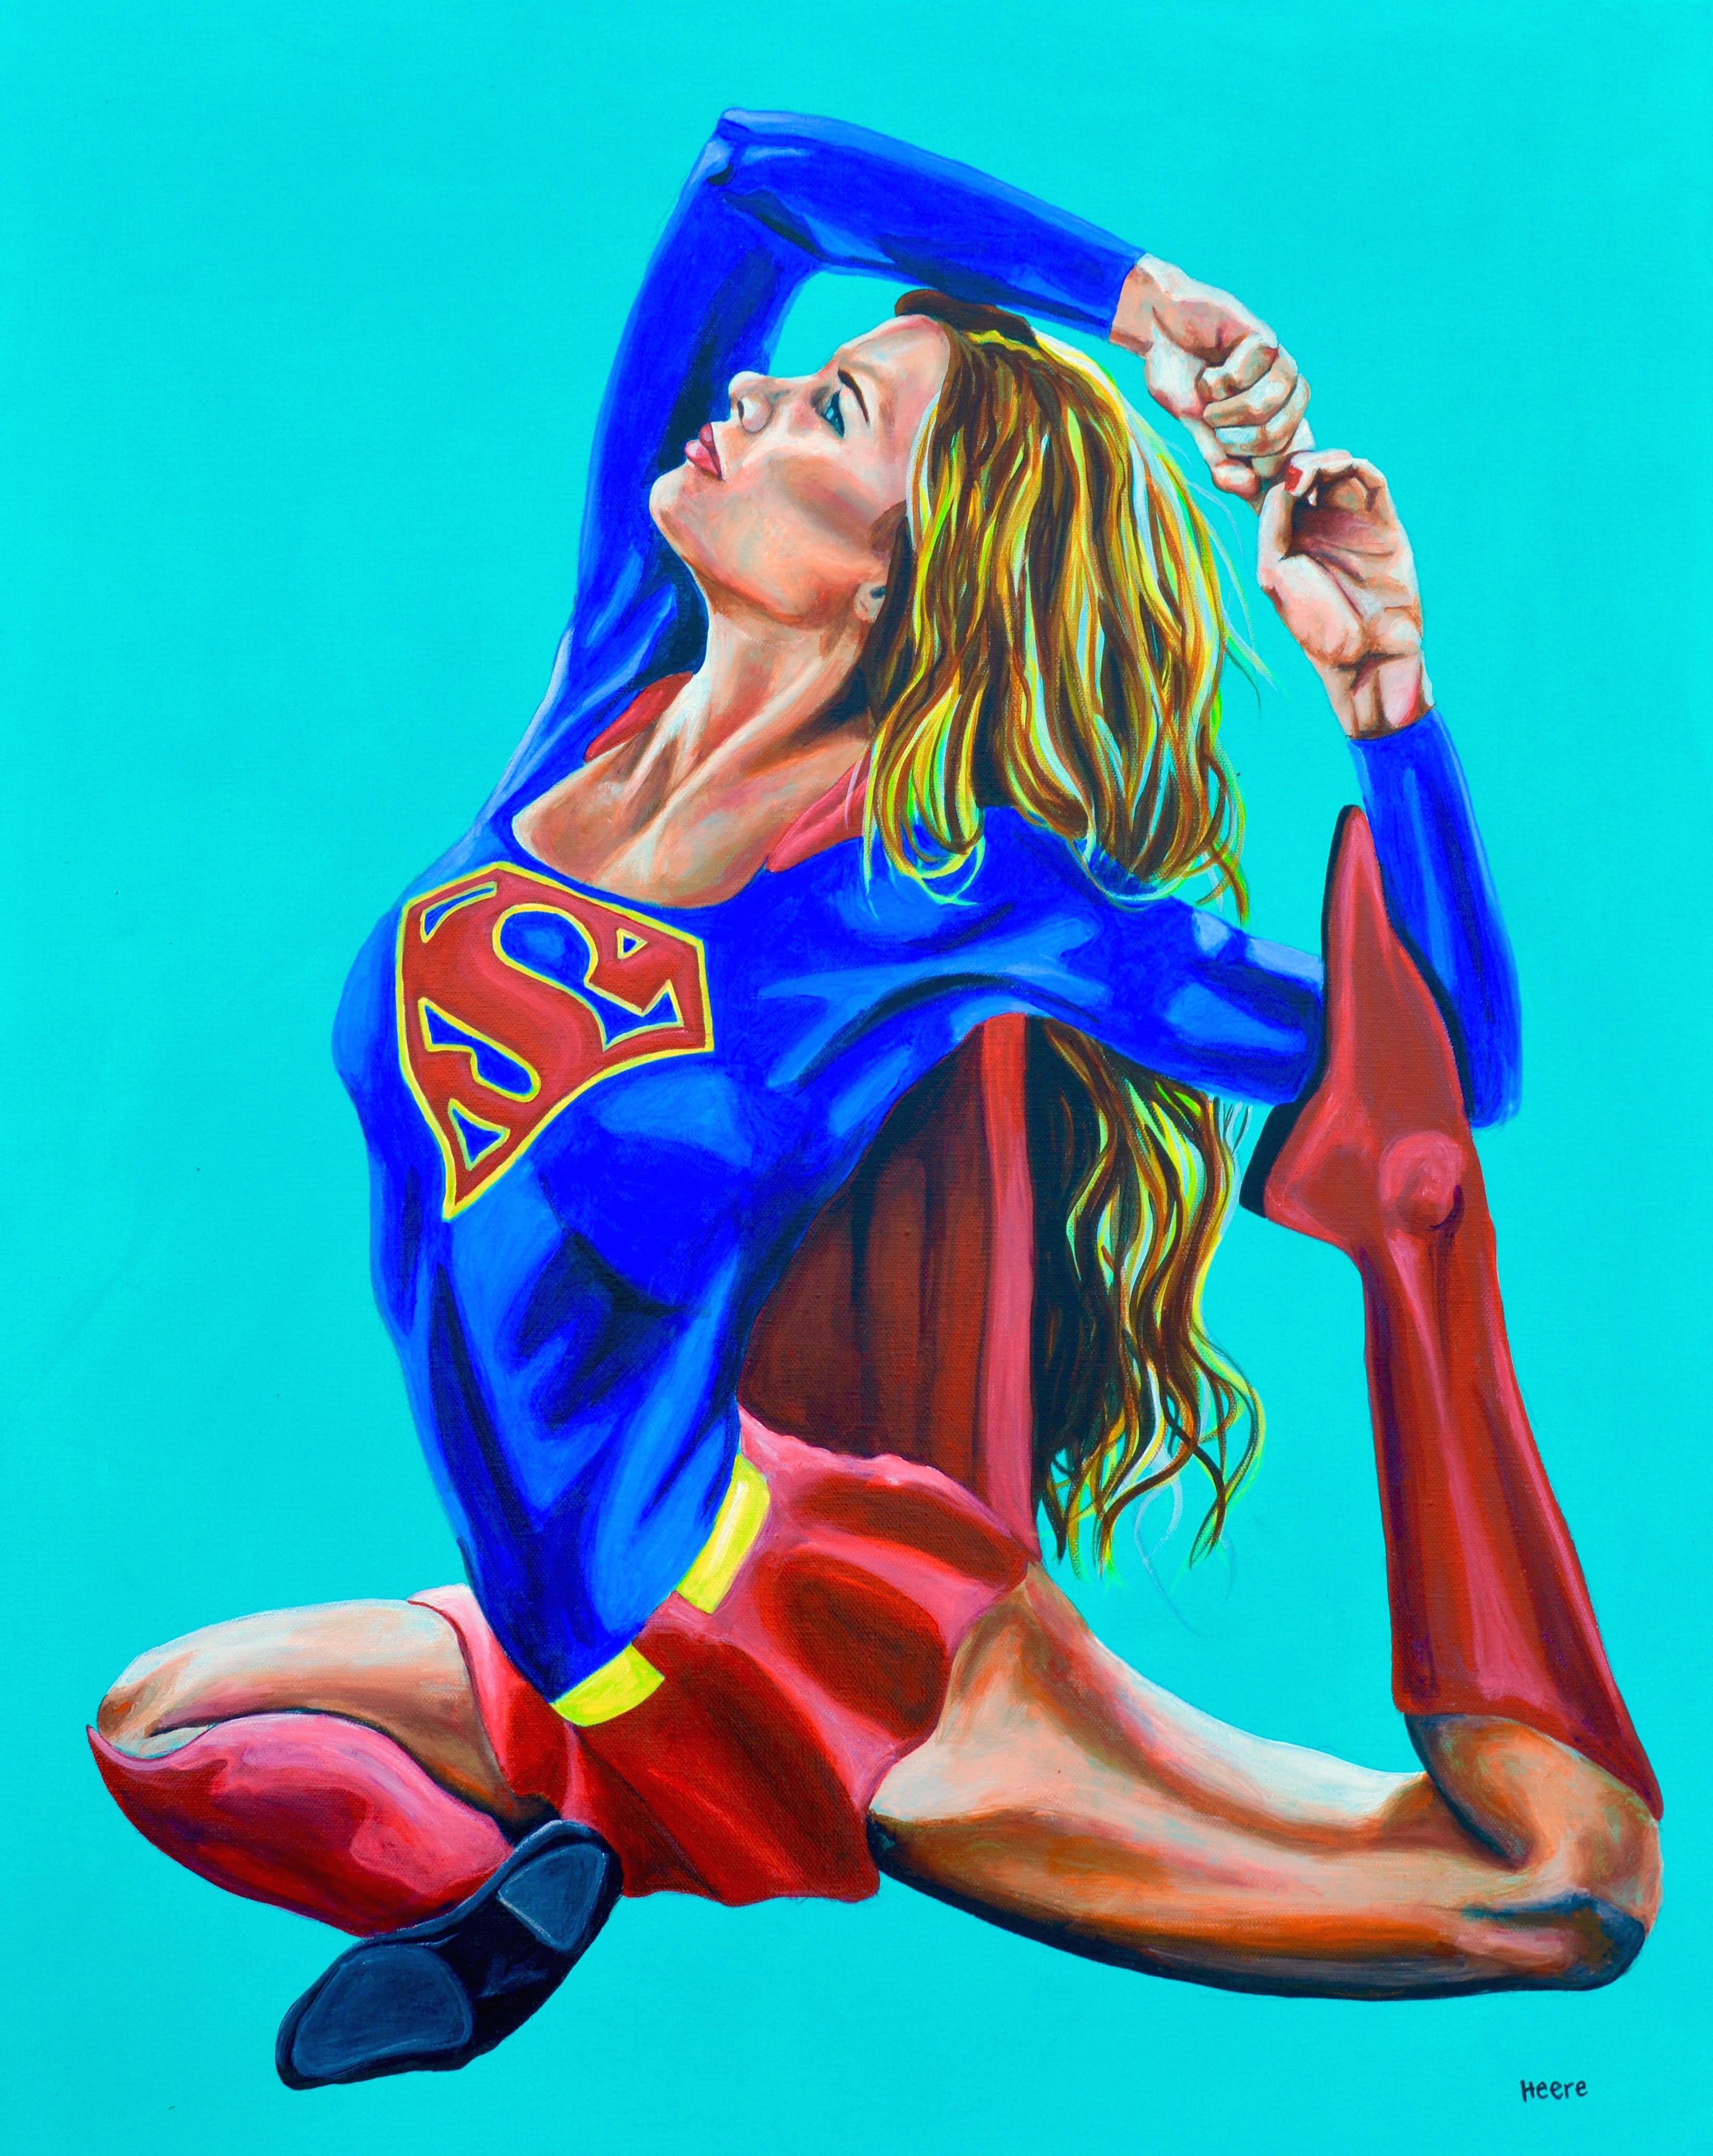 Supergirl Yogi